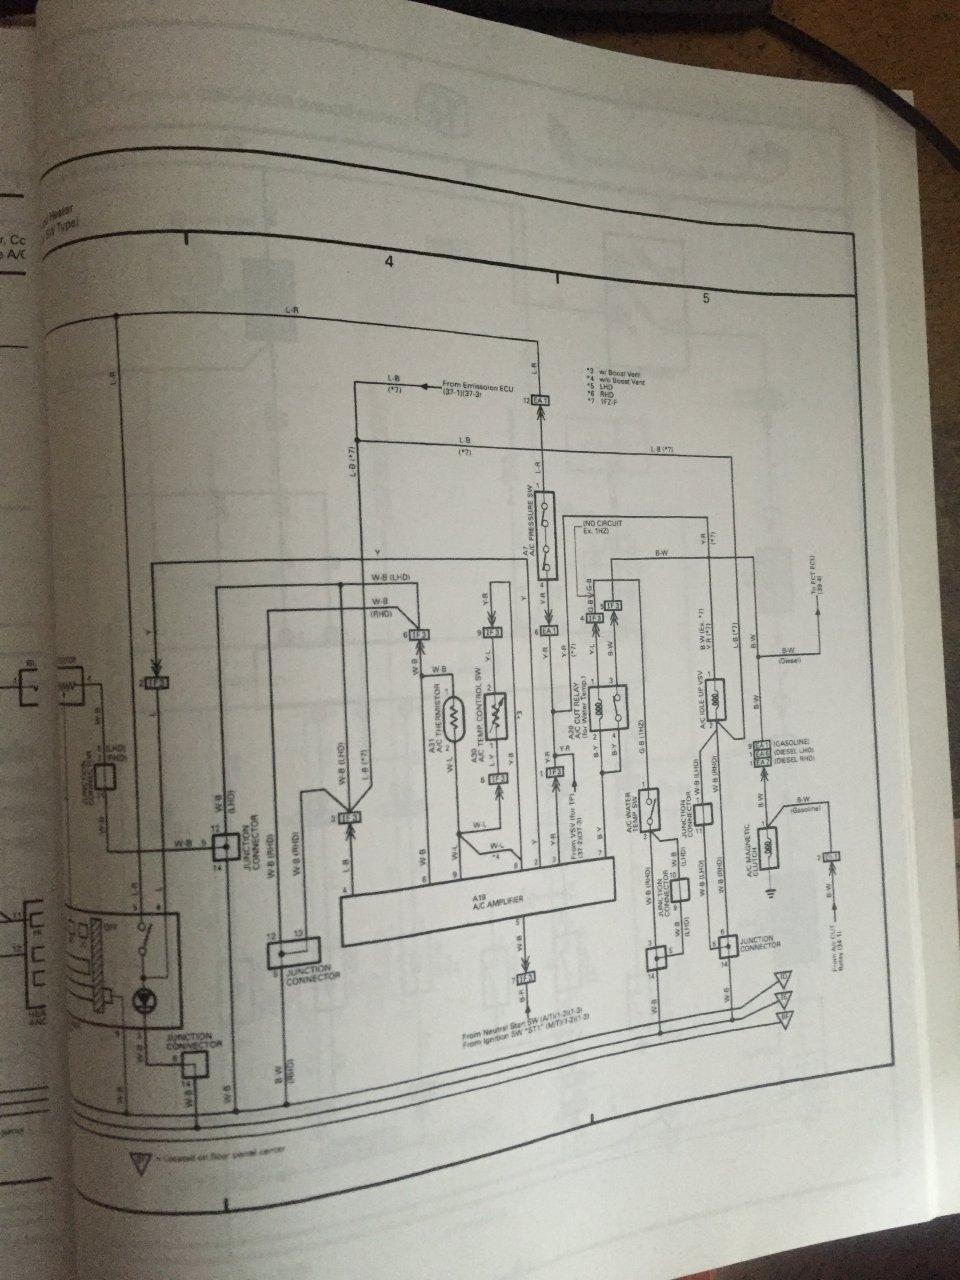 hight resolution of toyota vdj79 wiring diagram wiring diagram toolbox electrical wiring diagrams toyota land cruiser vdj79